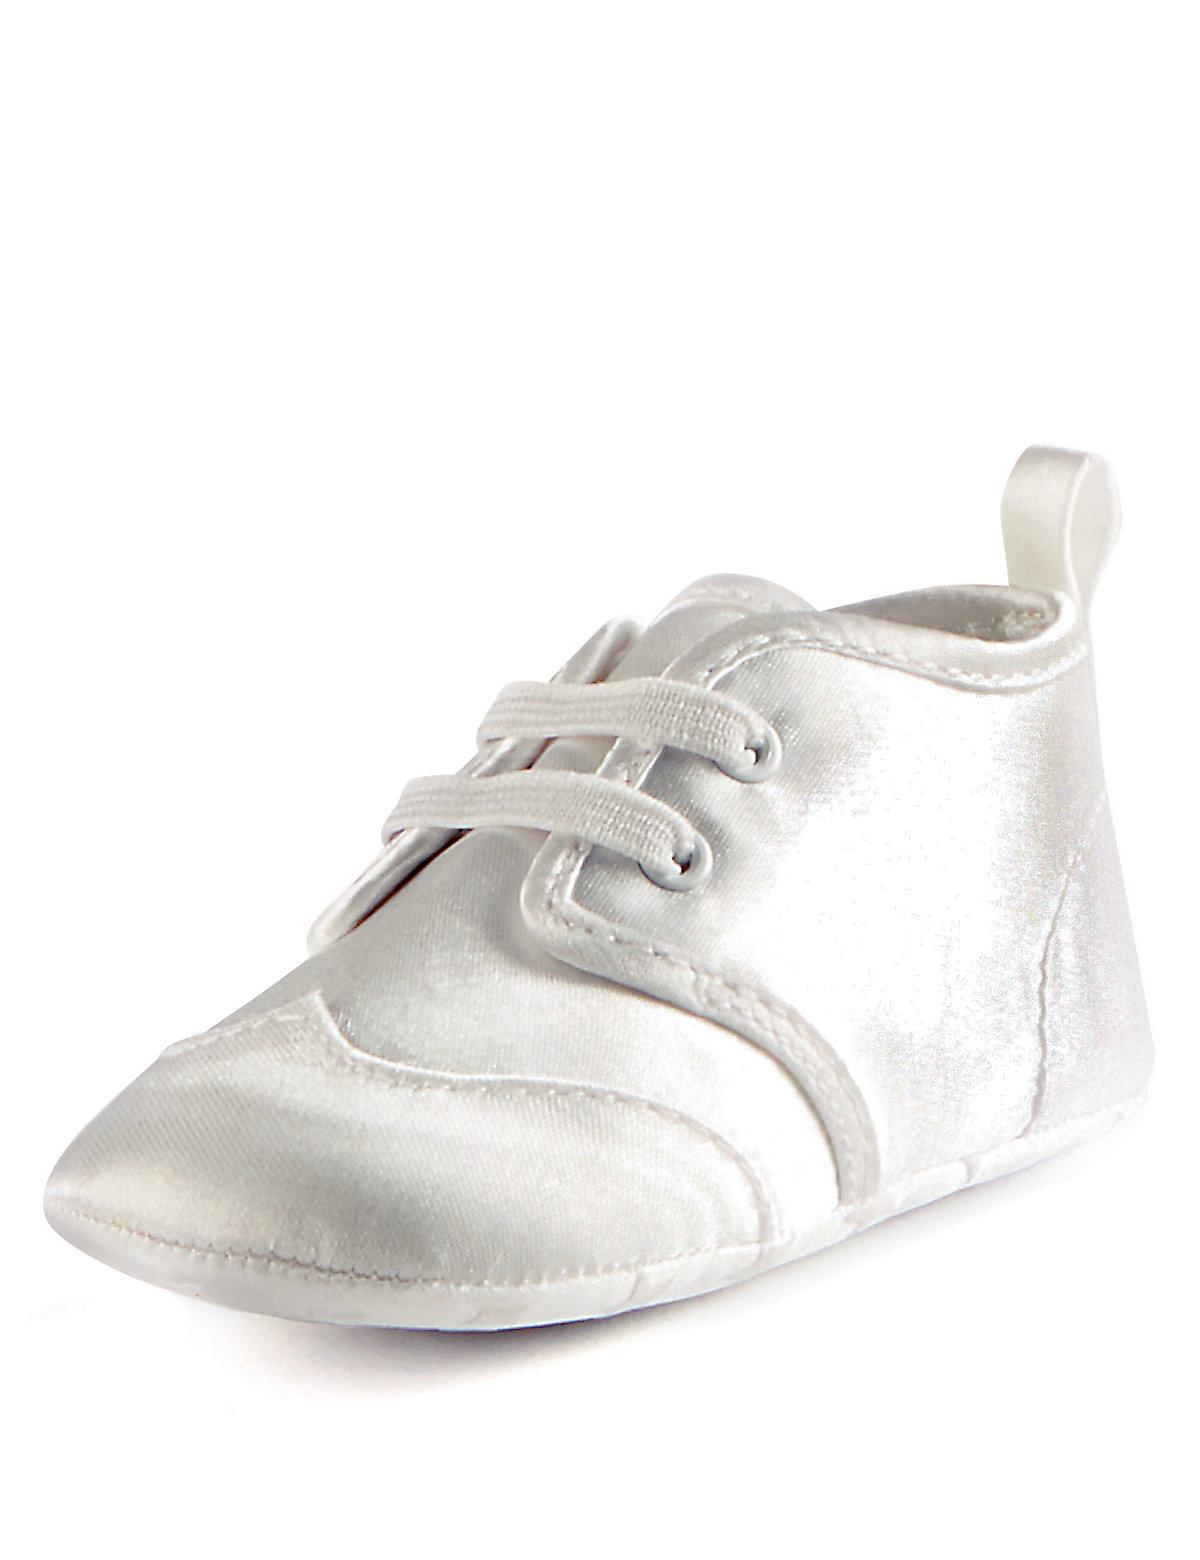 Baby Christening Pram Shoes